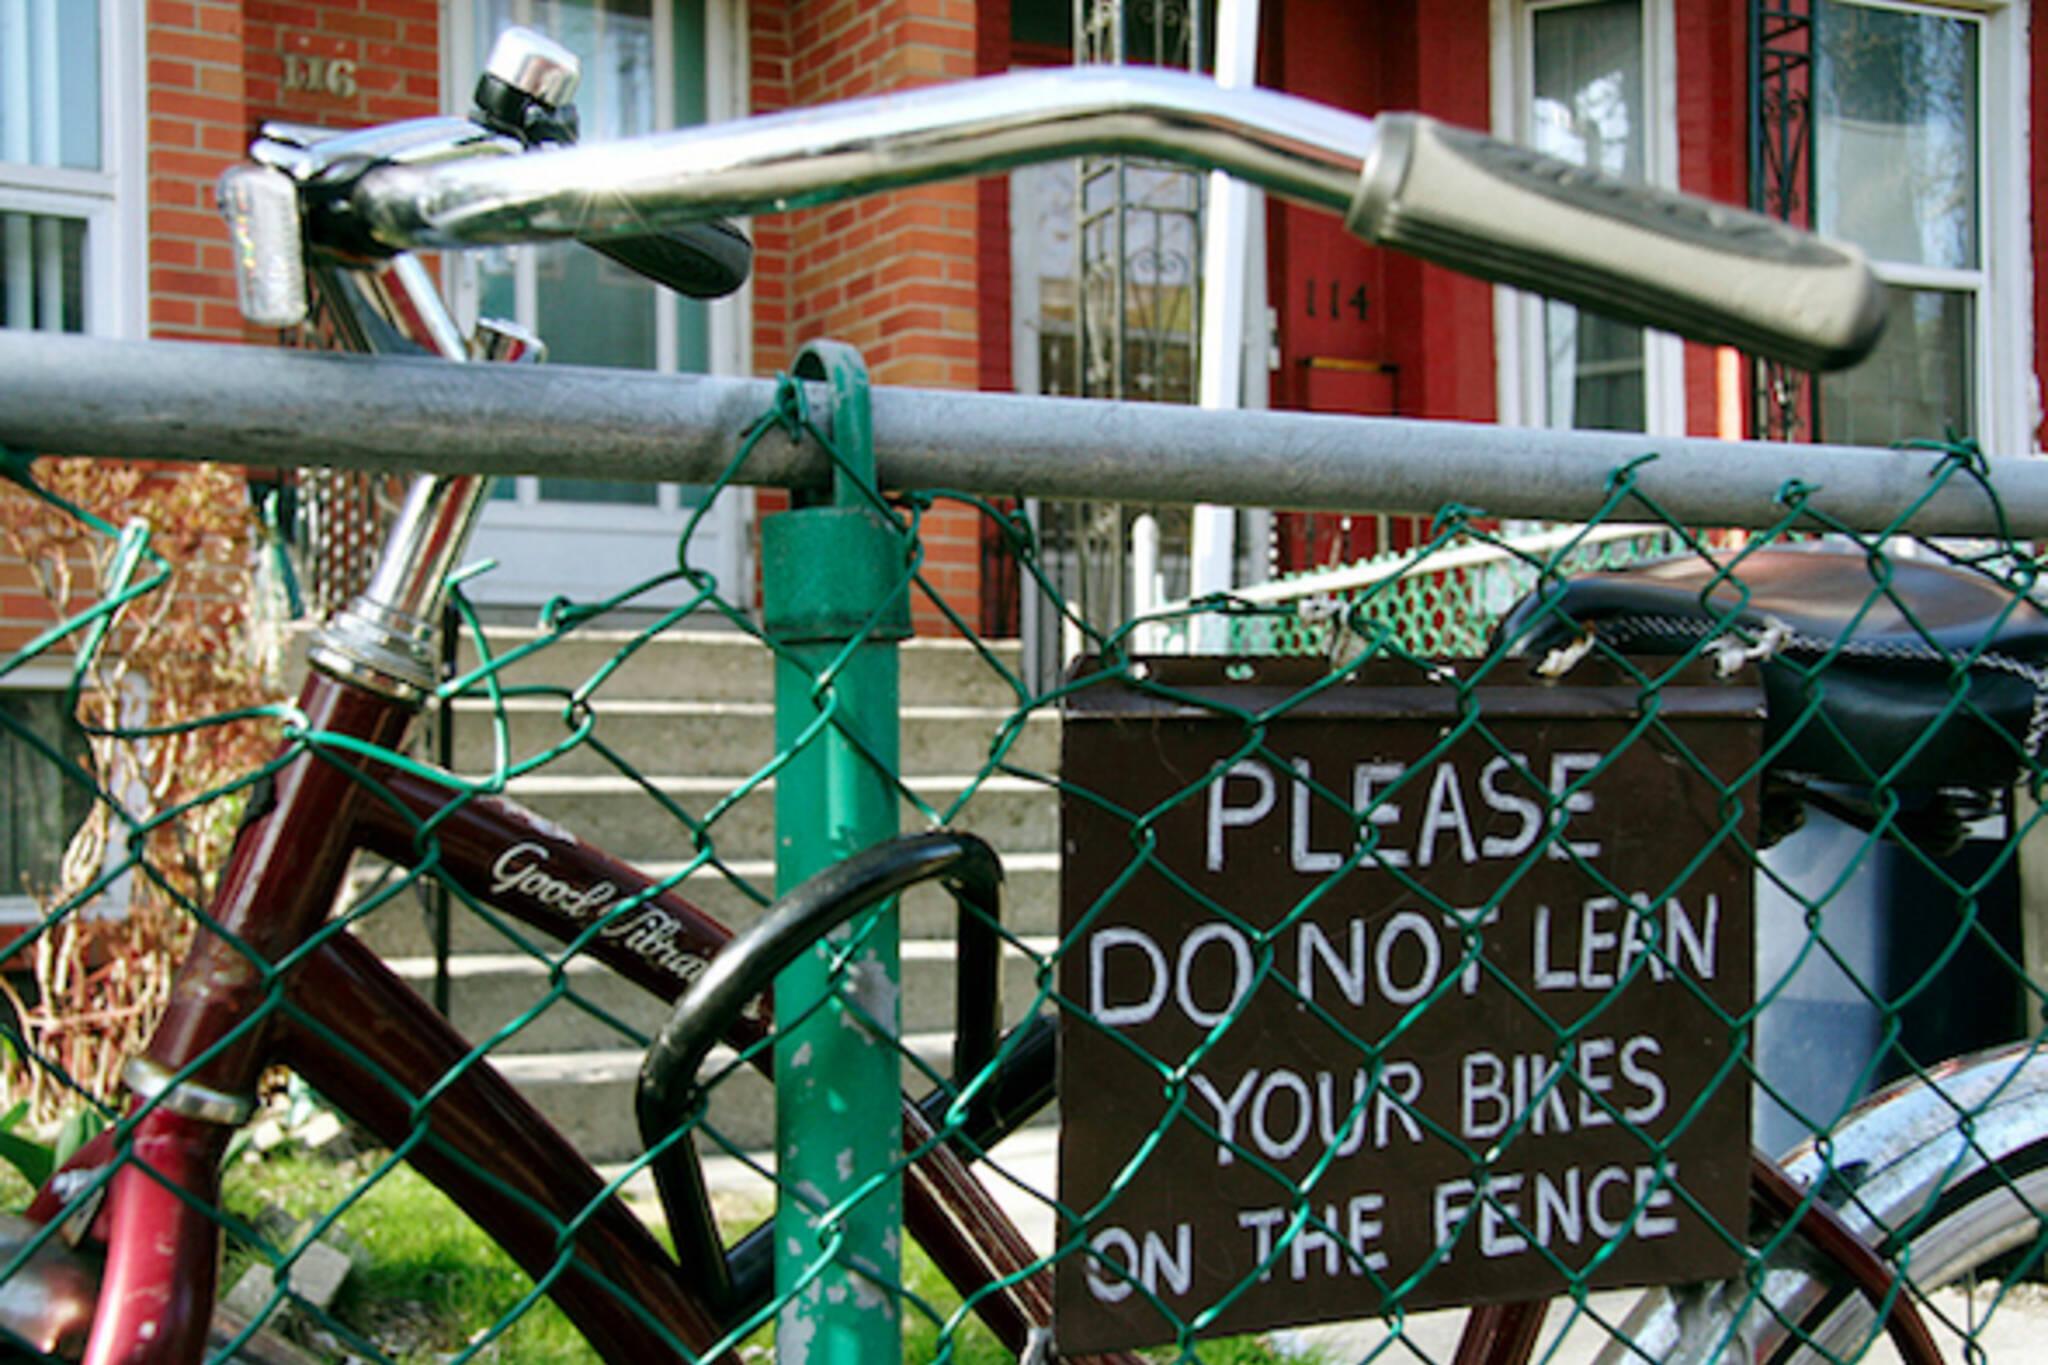 Morning Brew Bike Kensington